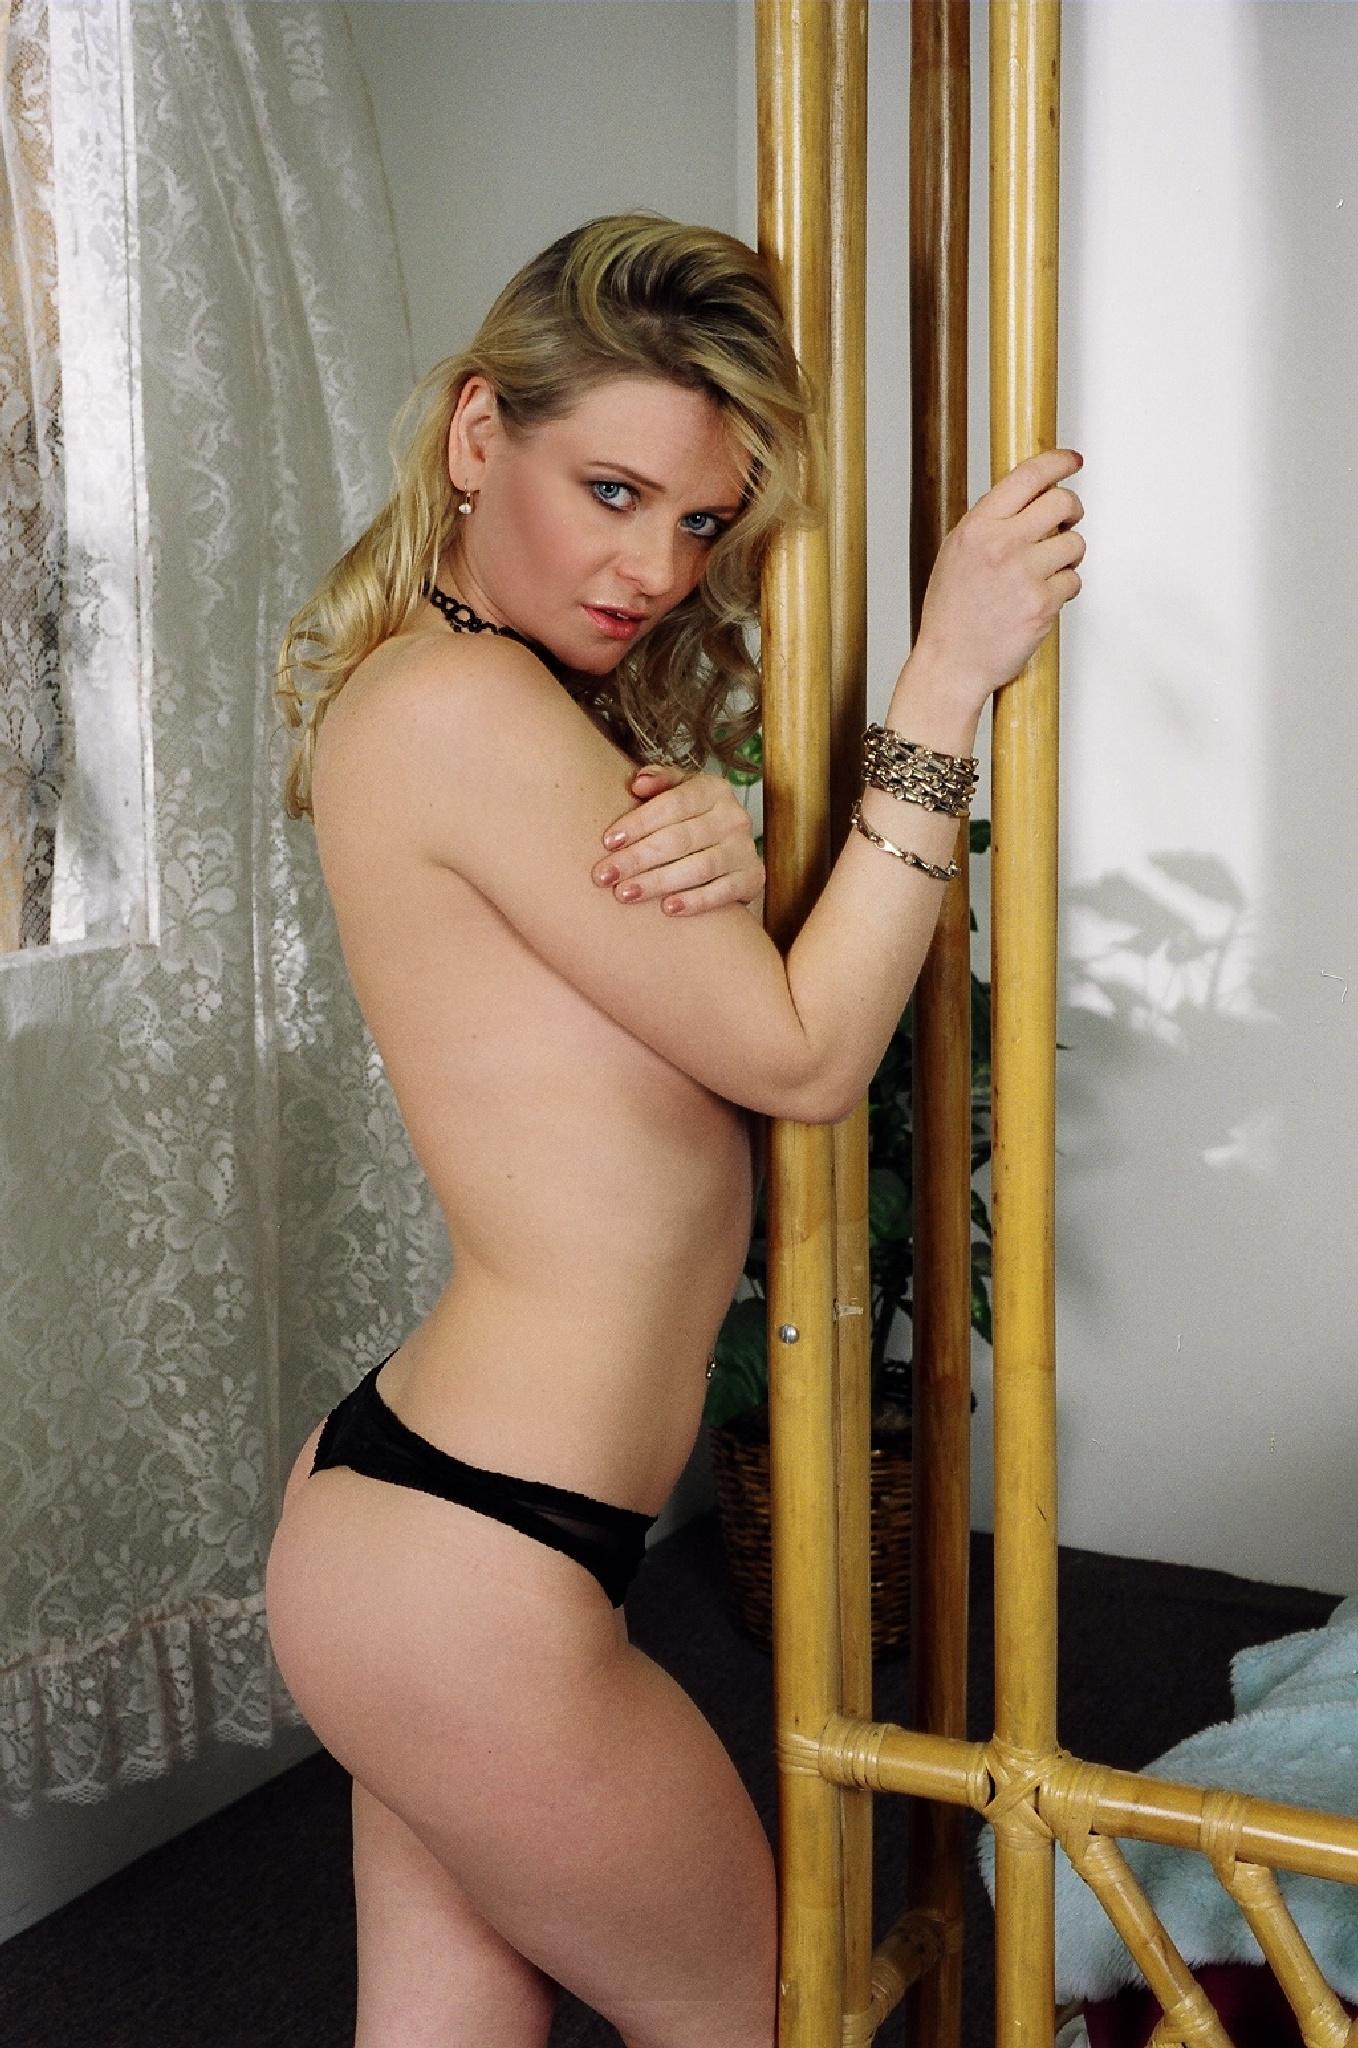 Elizabeth Sexy Lingerie Shoot In Loft Studios by Don Christian